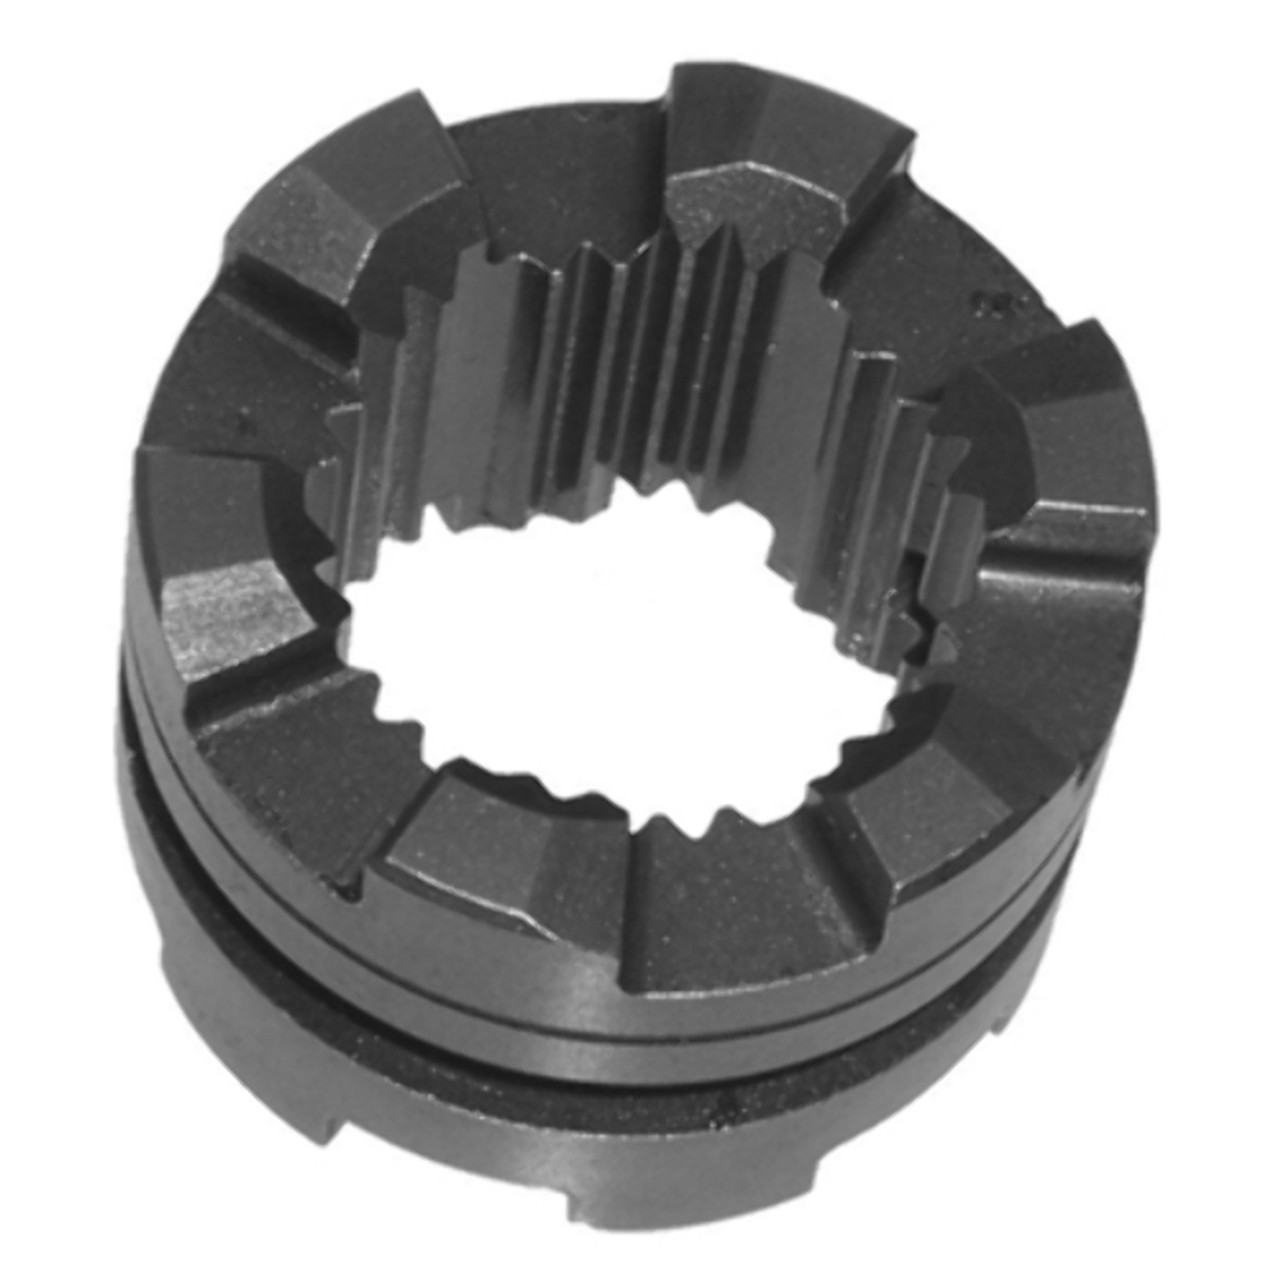 small resolution of johnson evinrude stringer 4 cylinder v6 v8 1992 1993 clutch dog 915272 0914716 happiemac marine